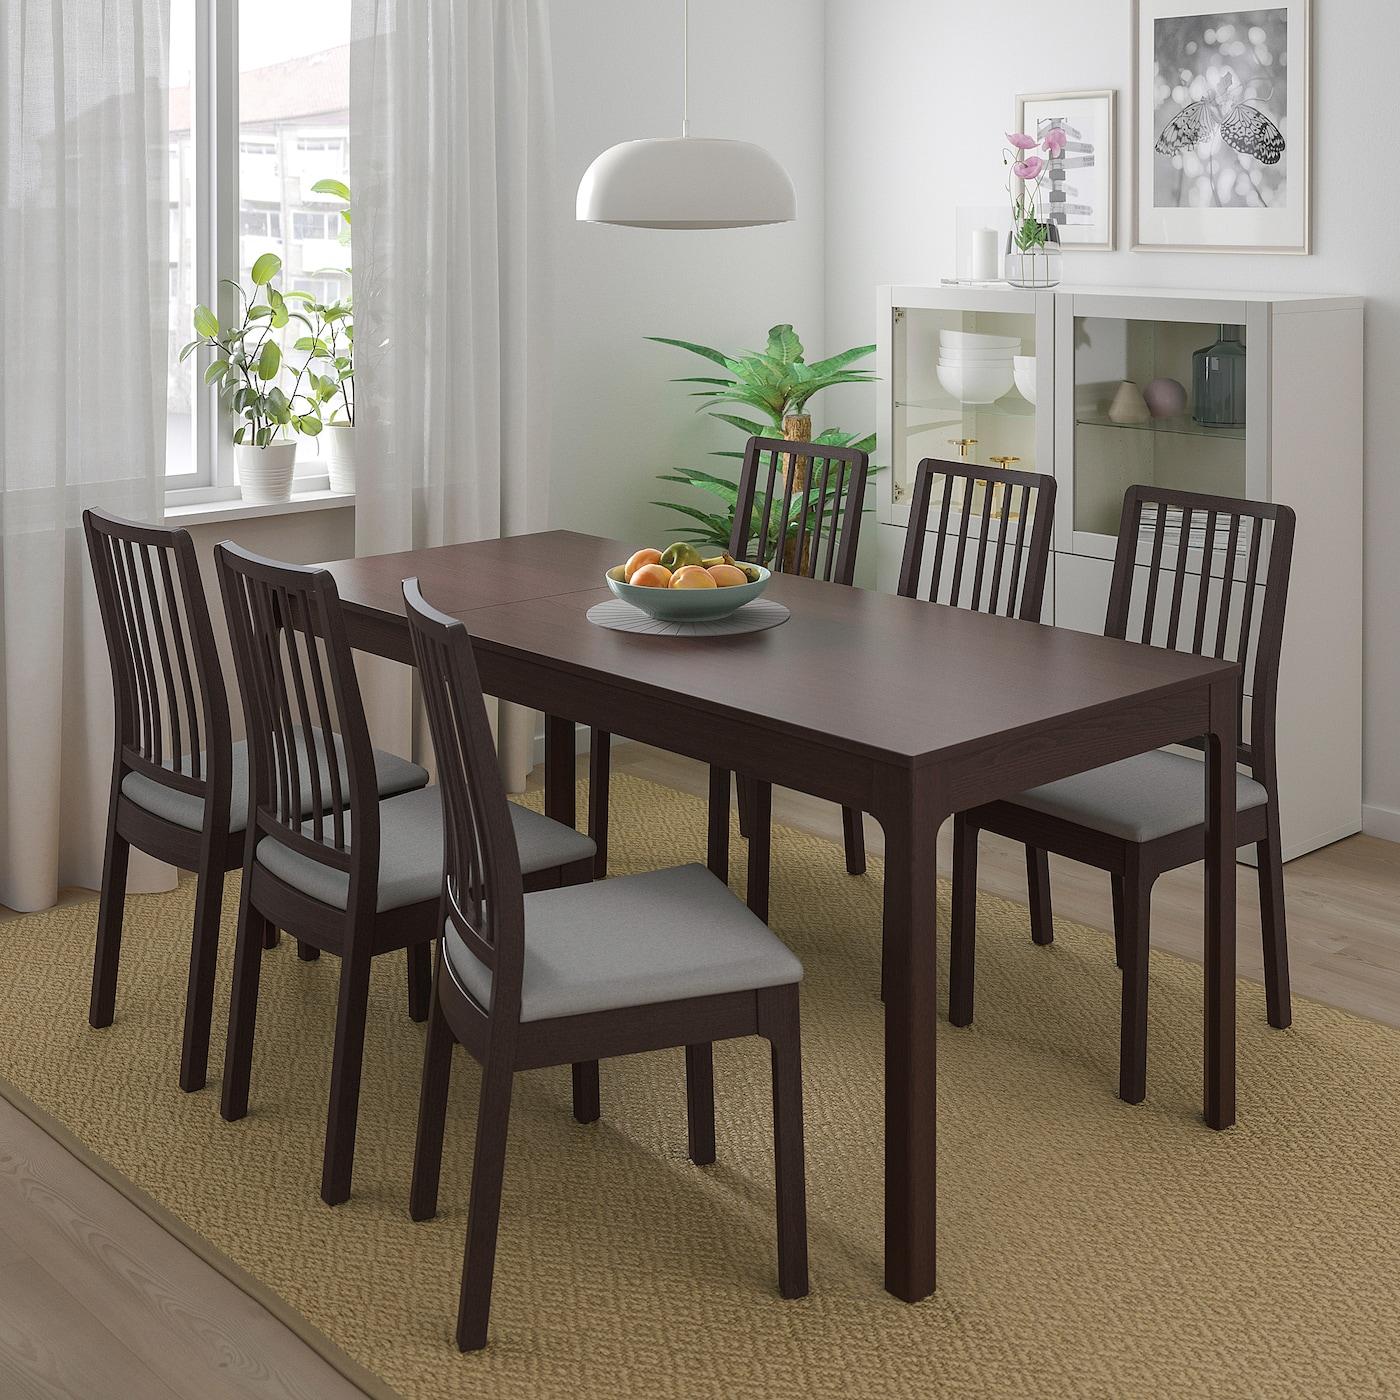 Ekedalen Extendable Table Dark Brown Min Length 47 1 4 Ikea